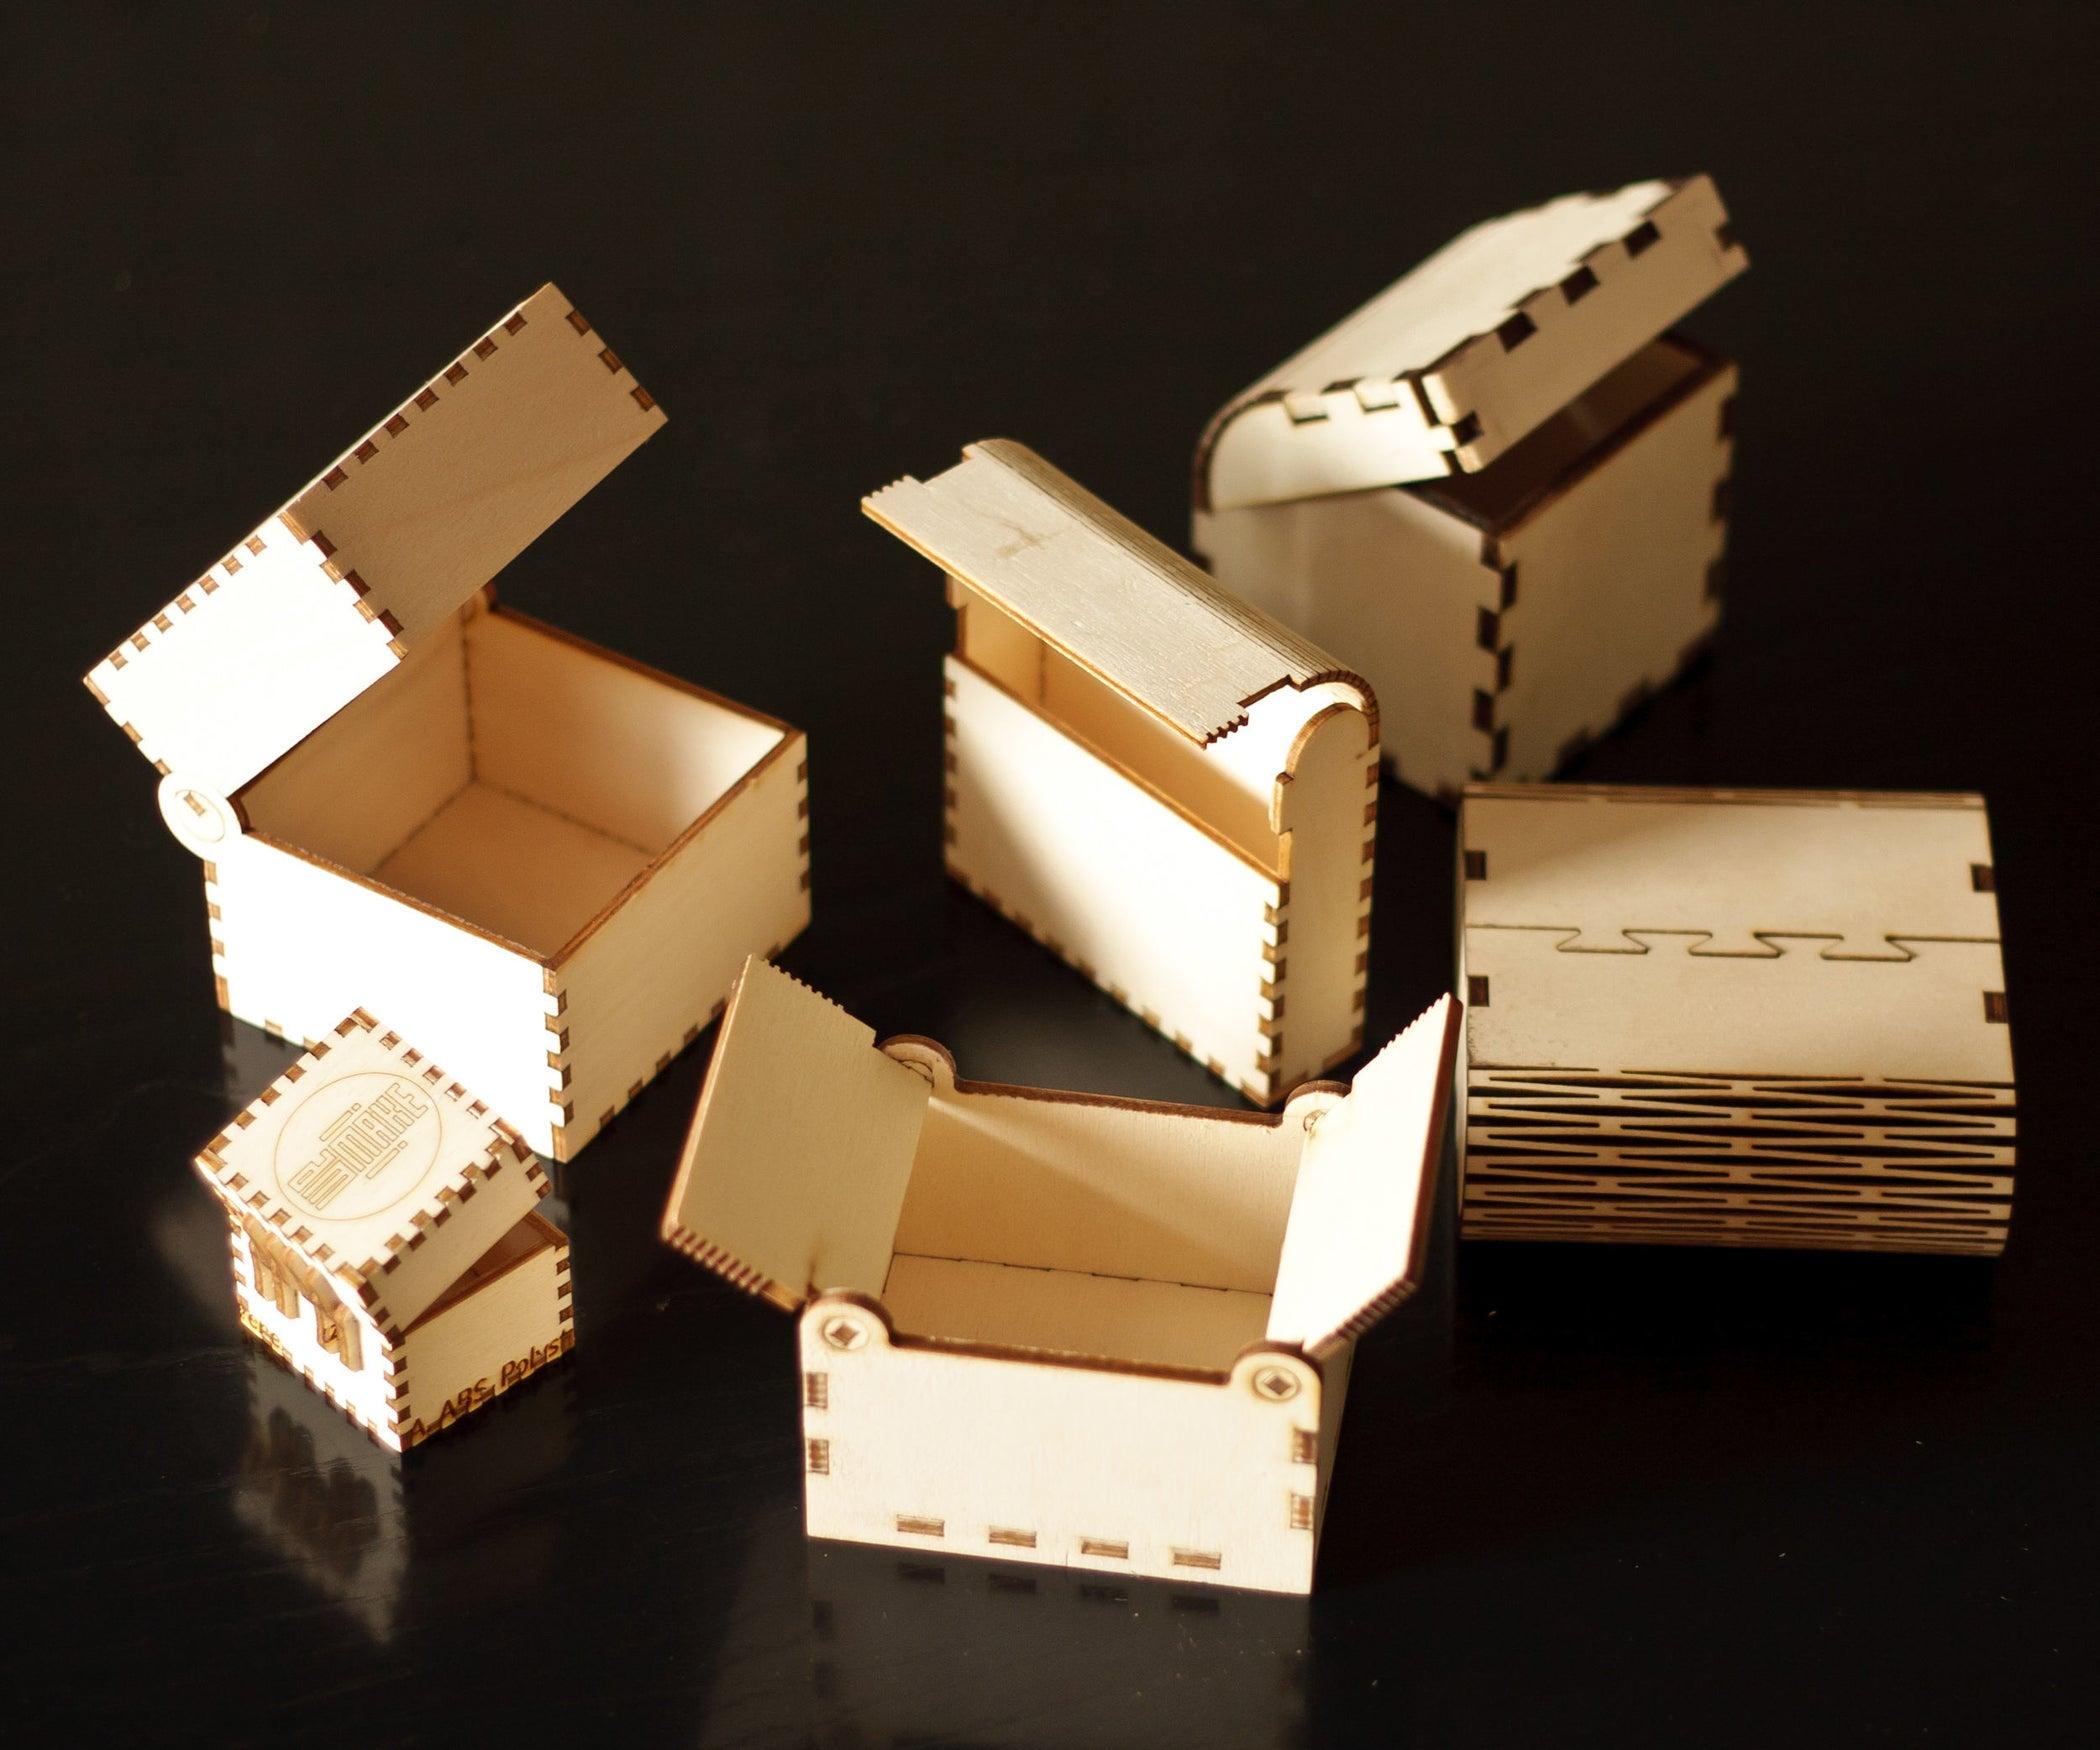 Lasercut Little Wood Boxes